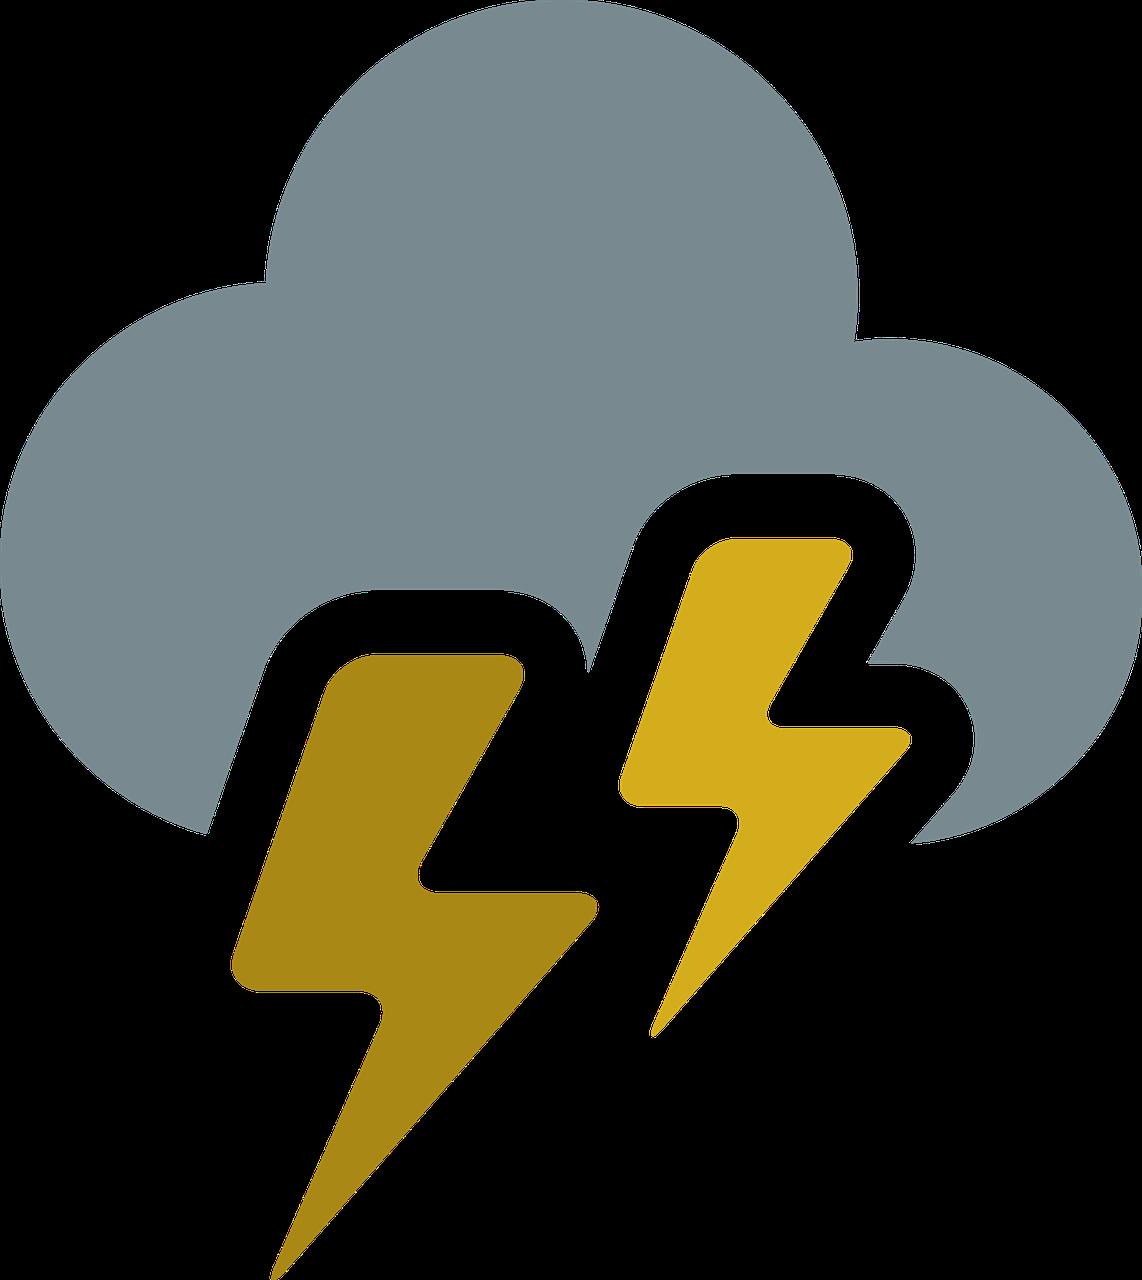 Cloudthunderelectricstormrain Free Photo From Needpix